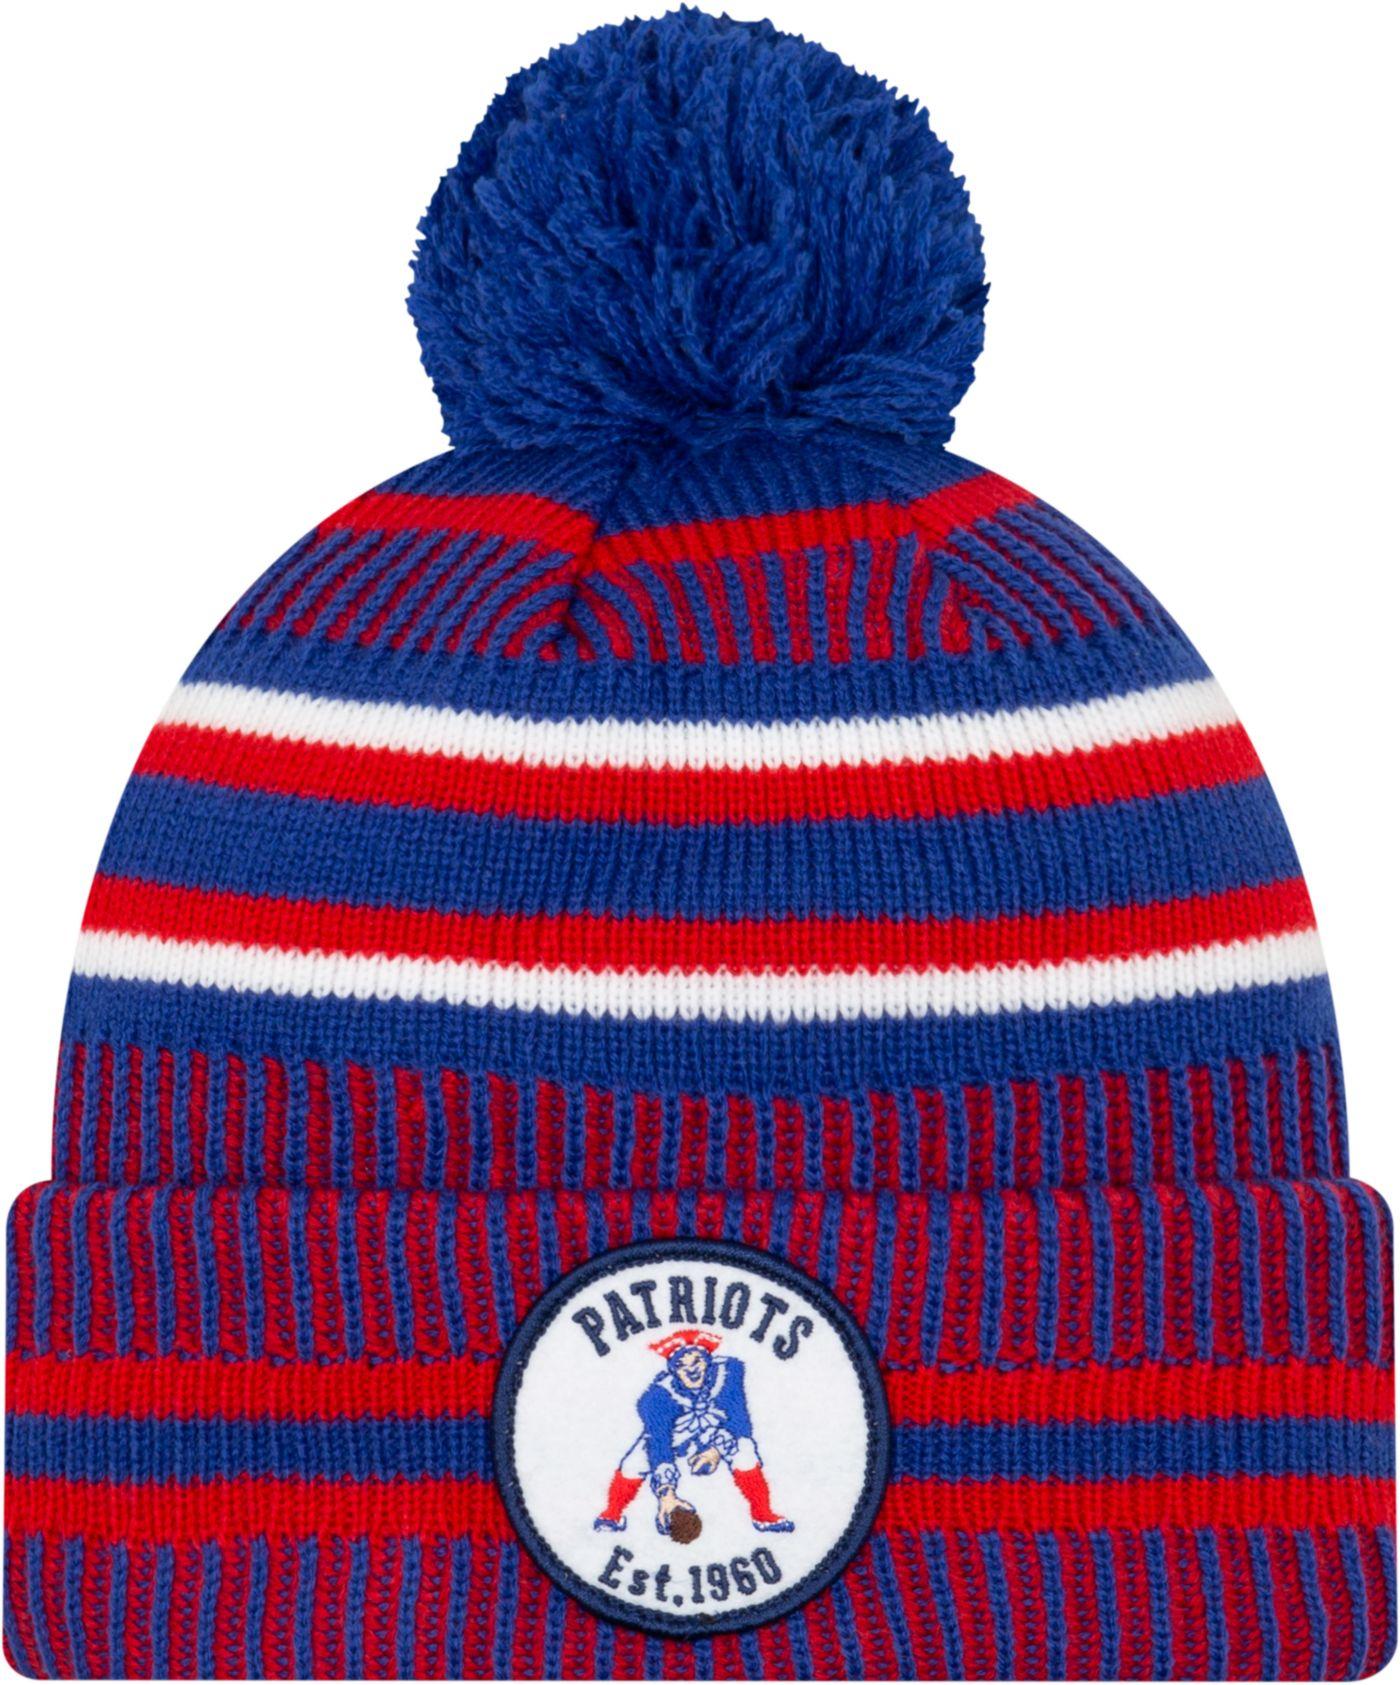 New Era Men's New England Patriots Sideline Home Sport Pom Knit